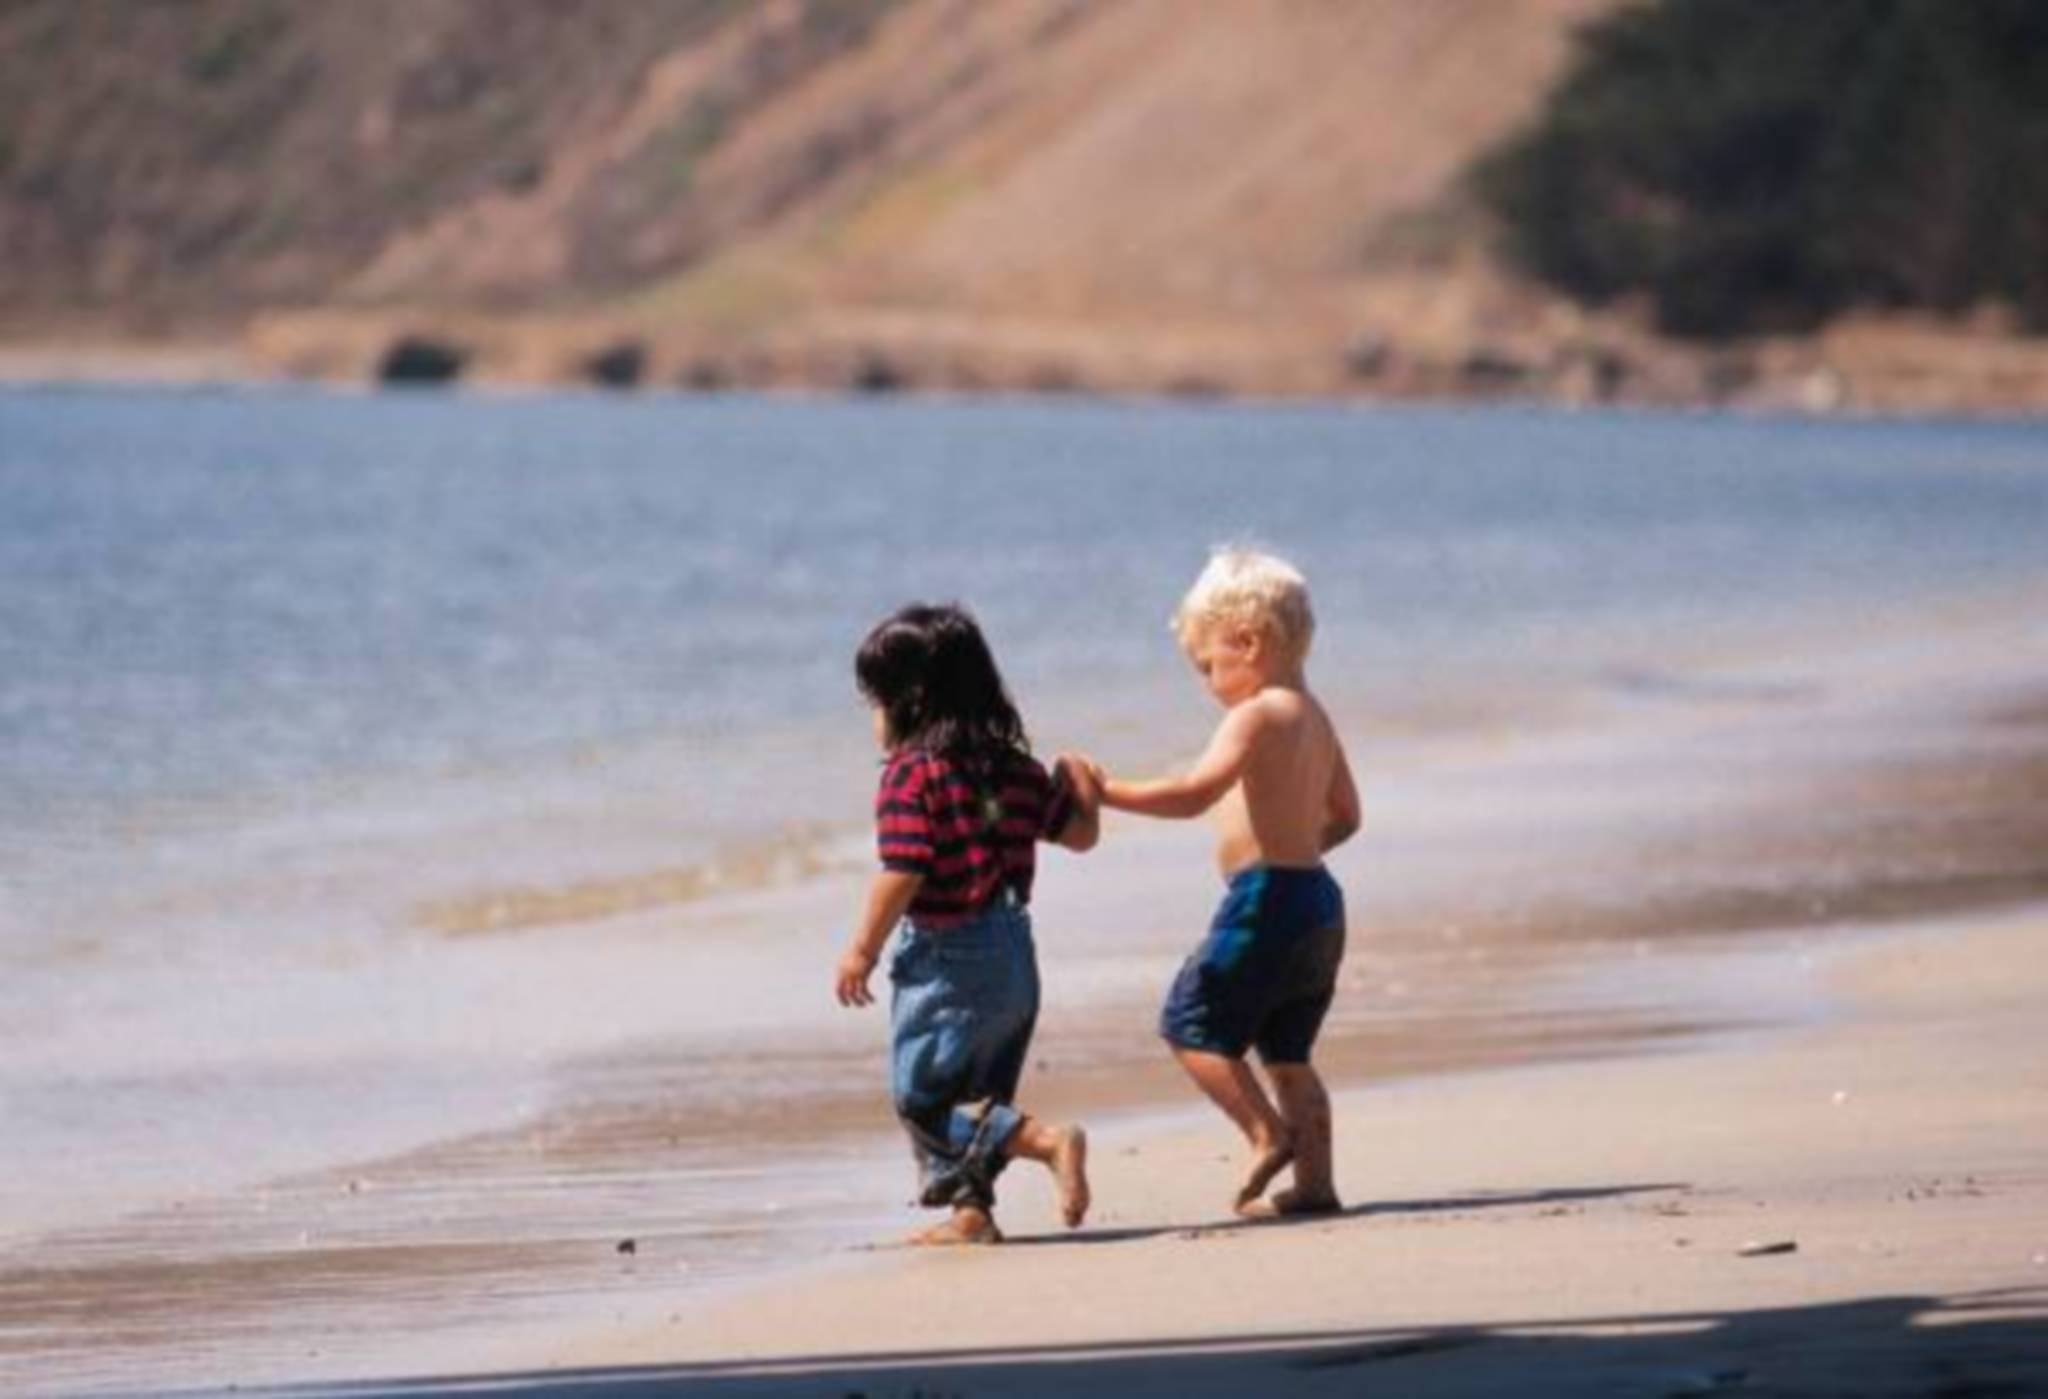 Парень и девушка на море: фото и картинки. - Depositphotos 73